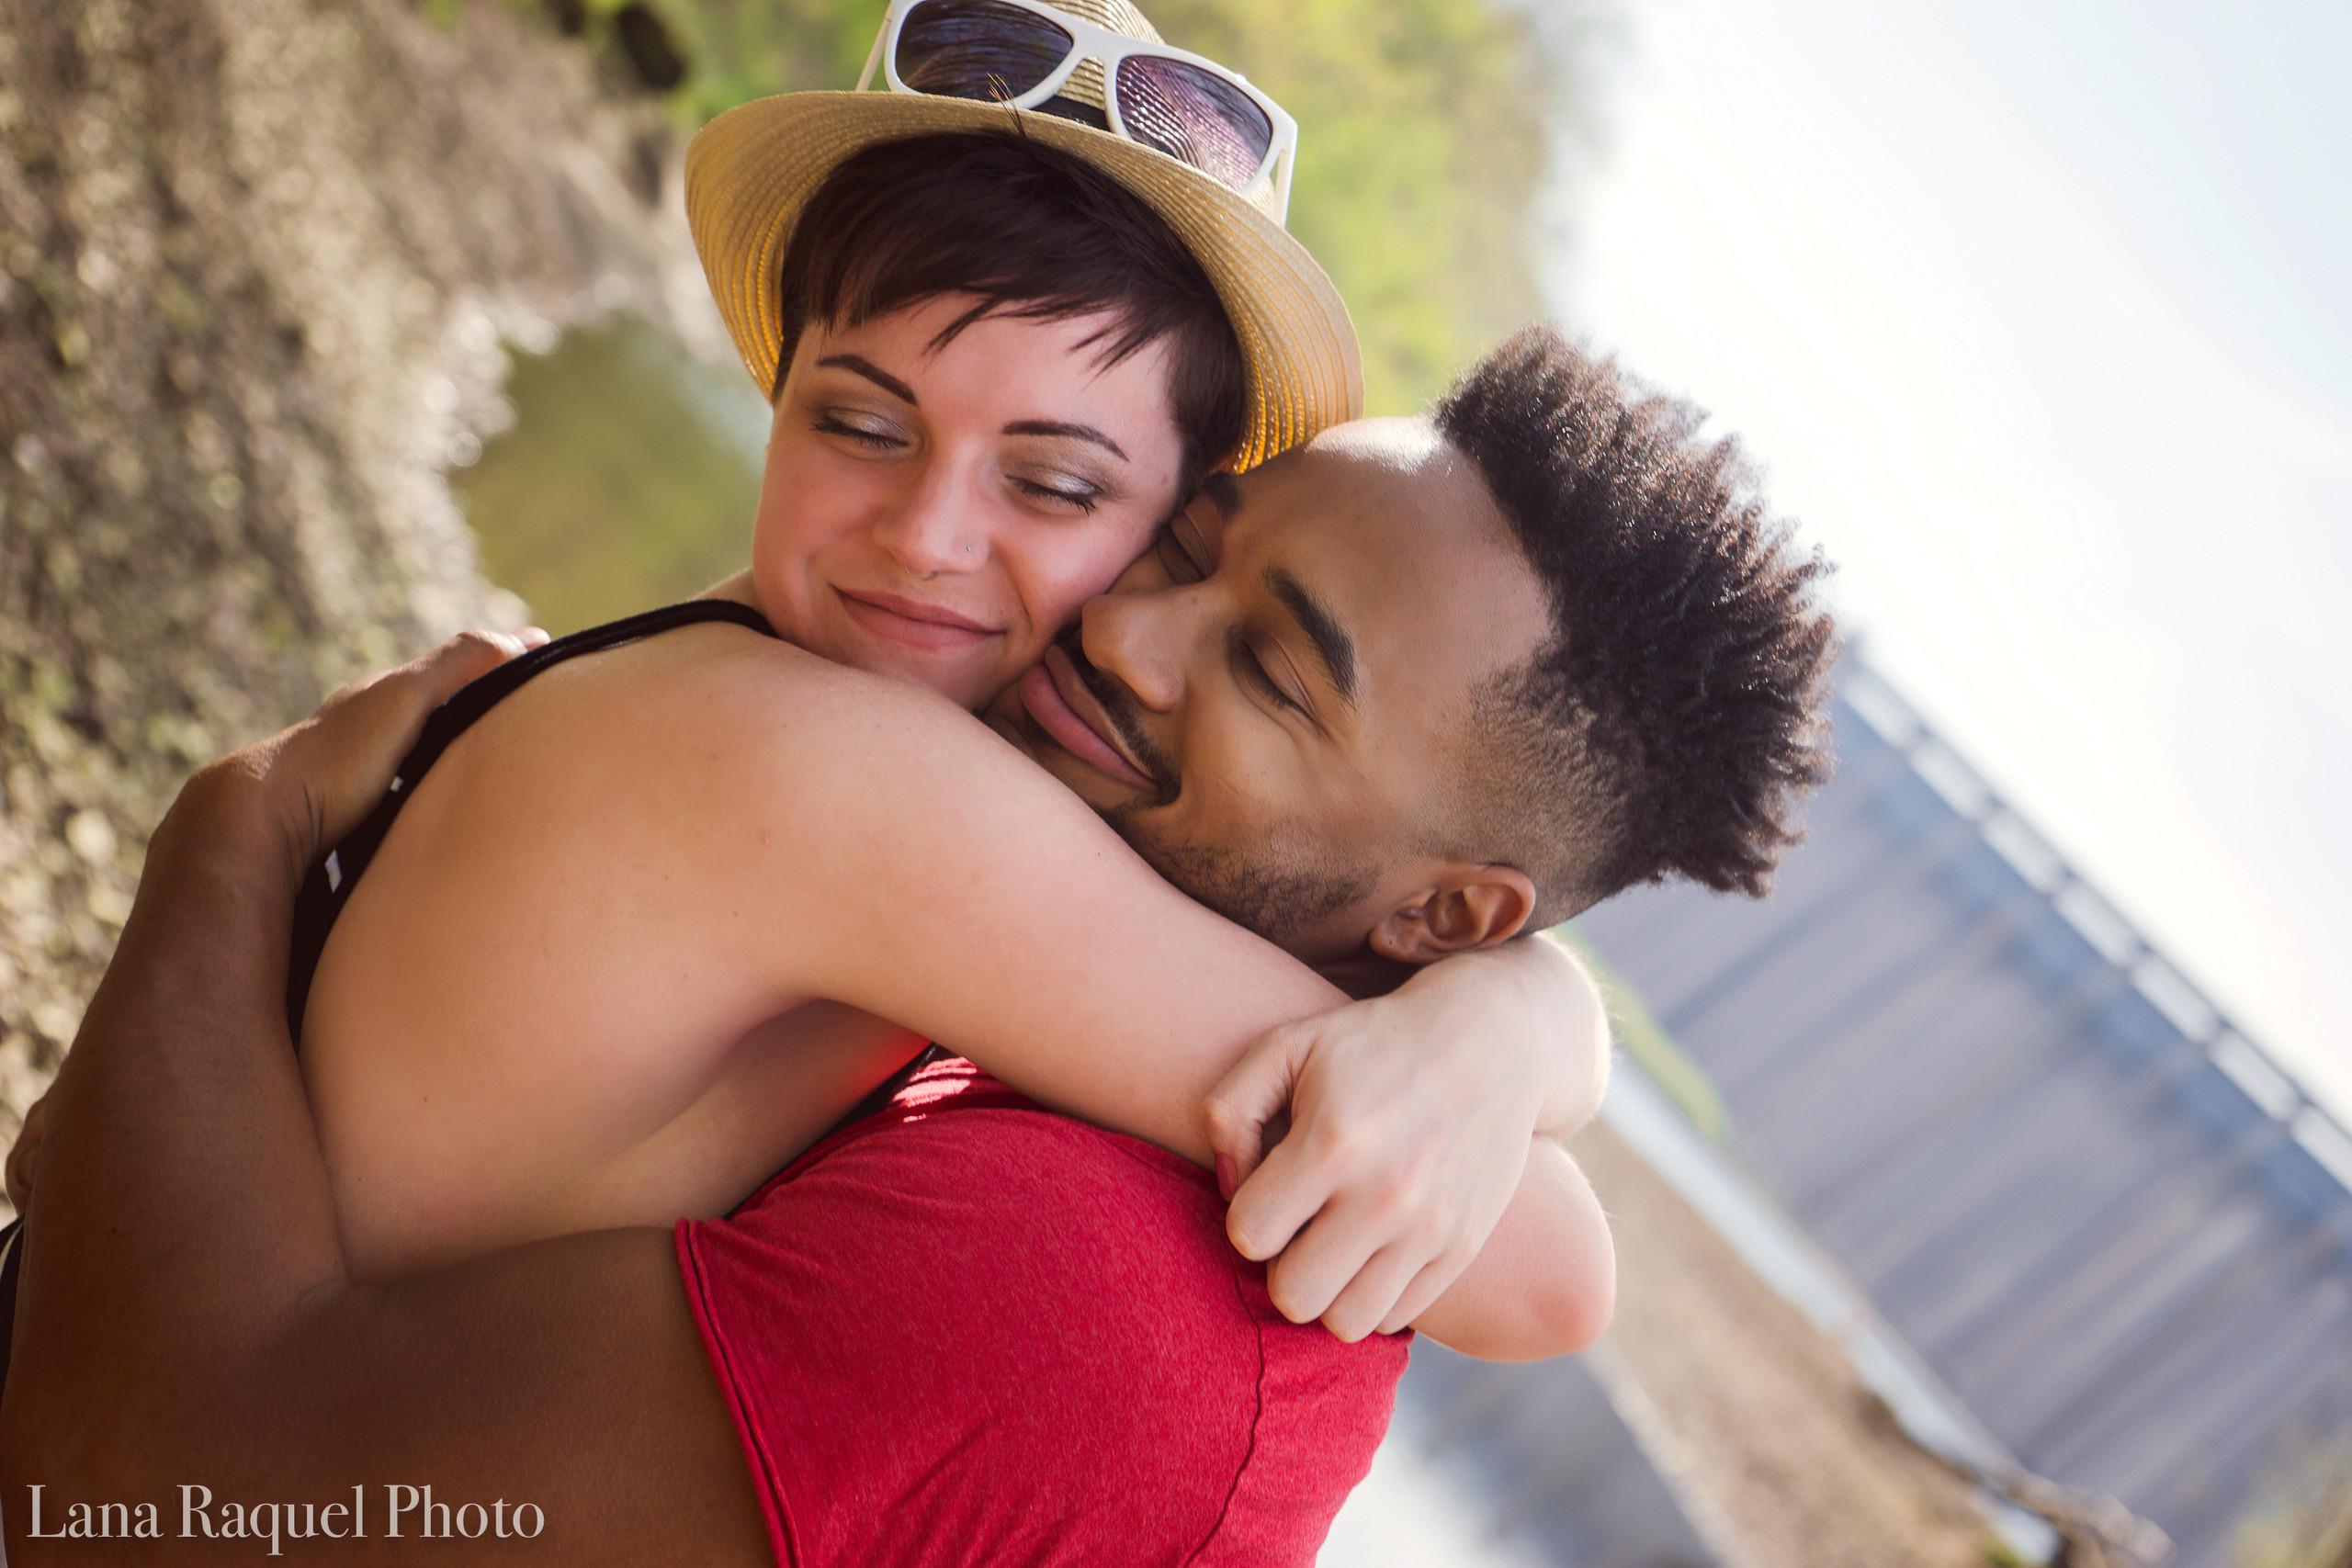 Boyfriend and Girlfriend Embrace